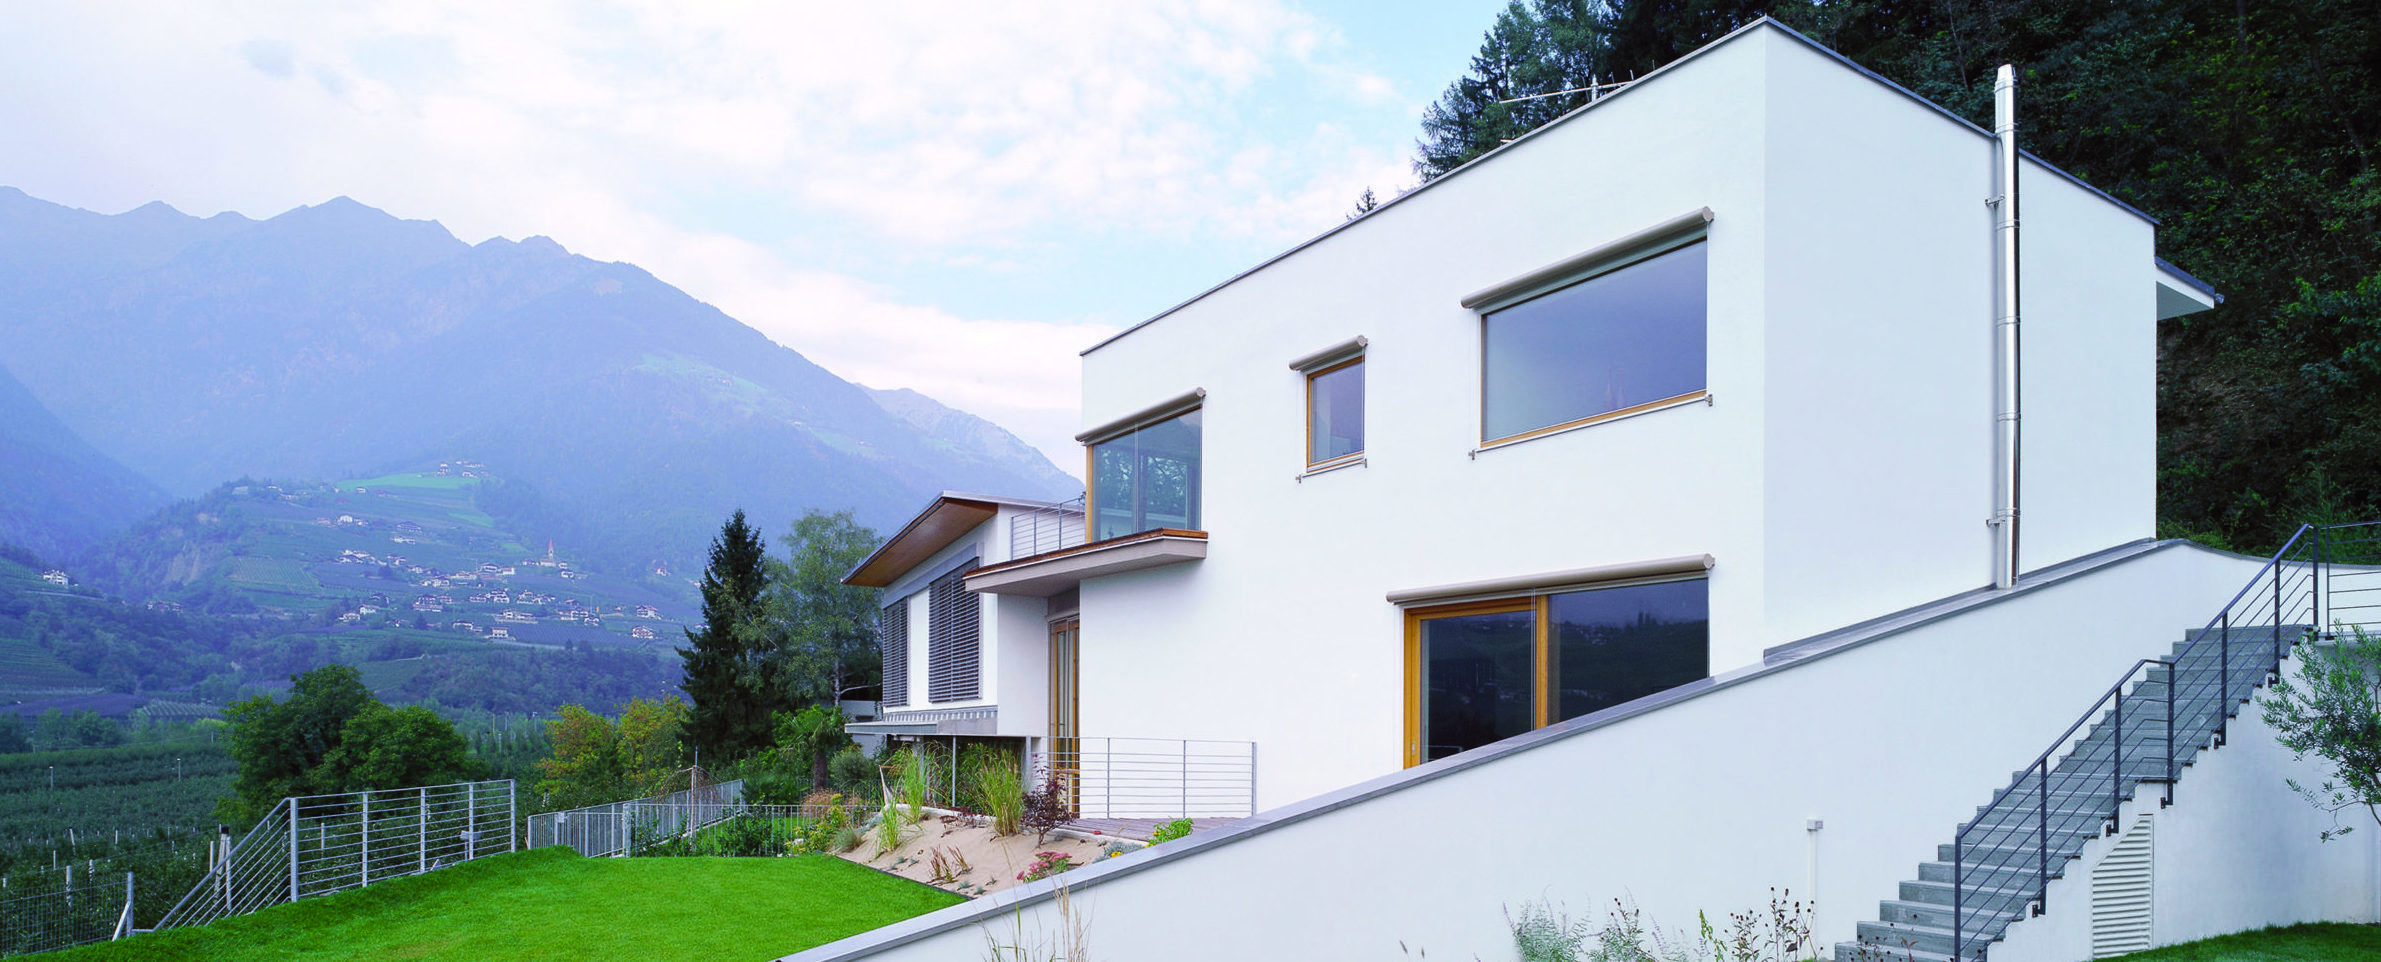 Cubushaus weiß Berge Holzfenster